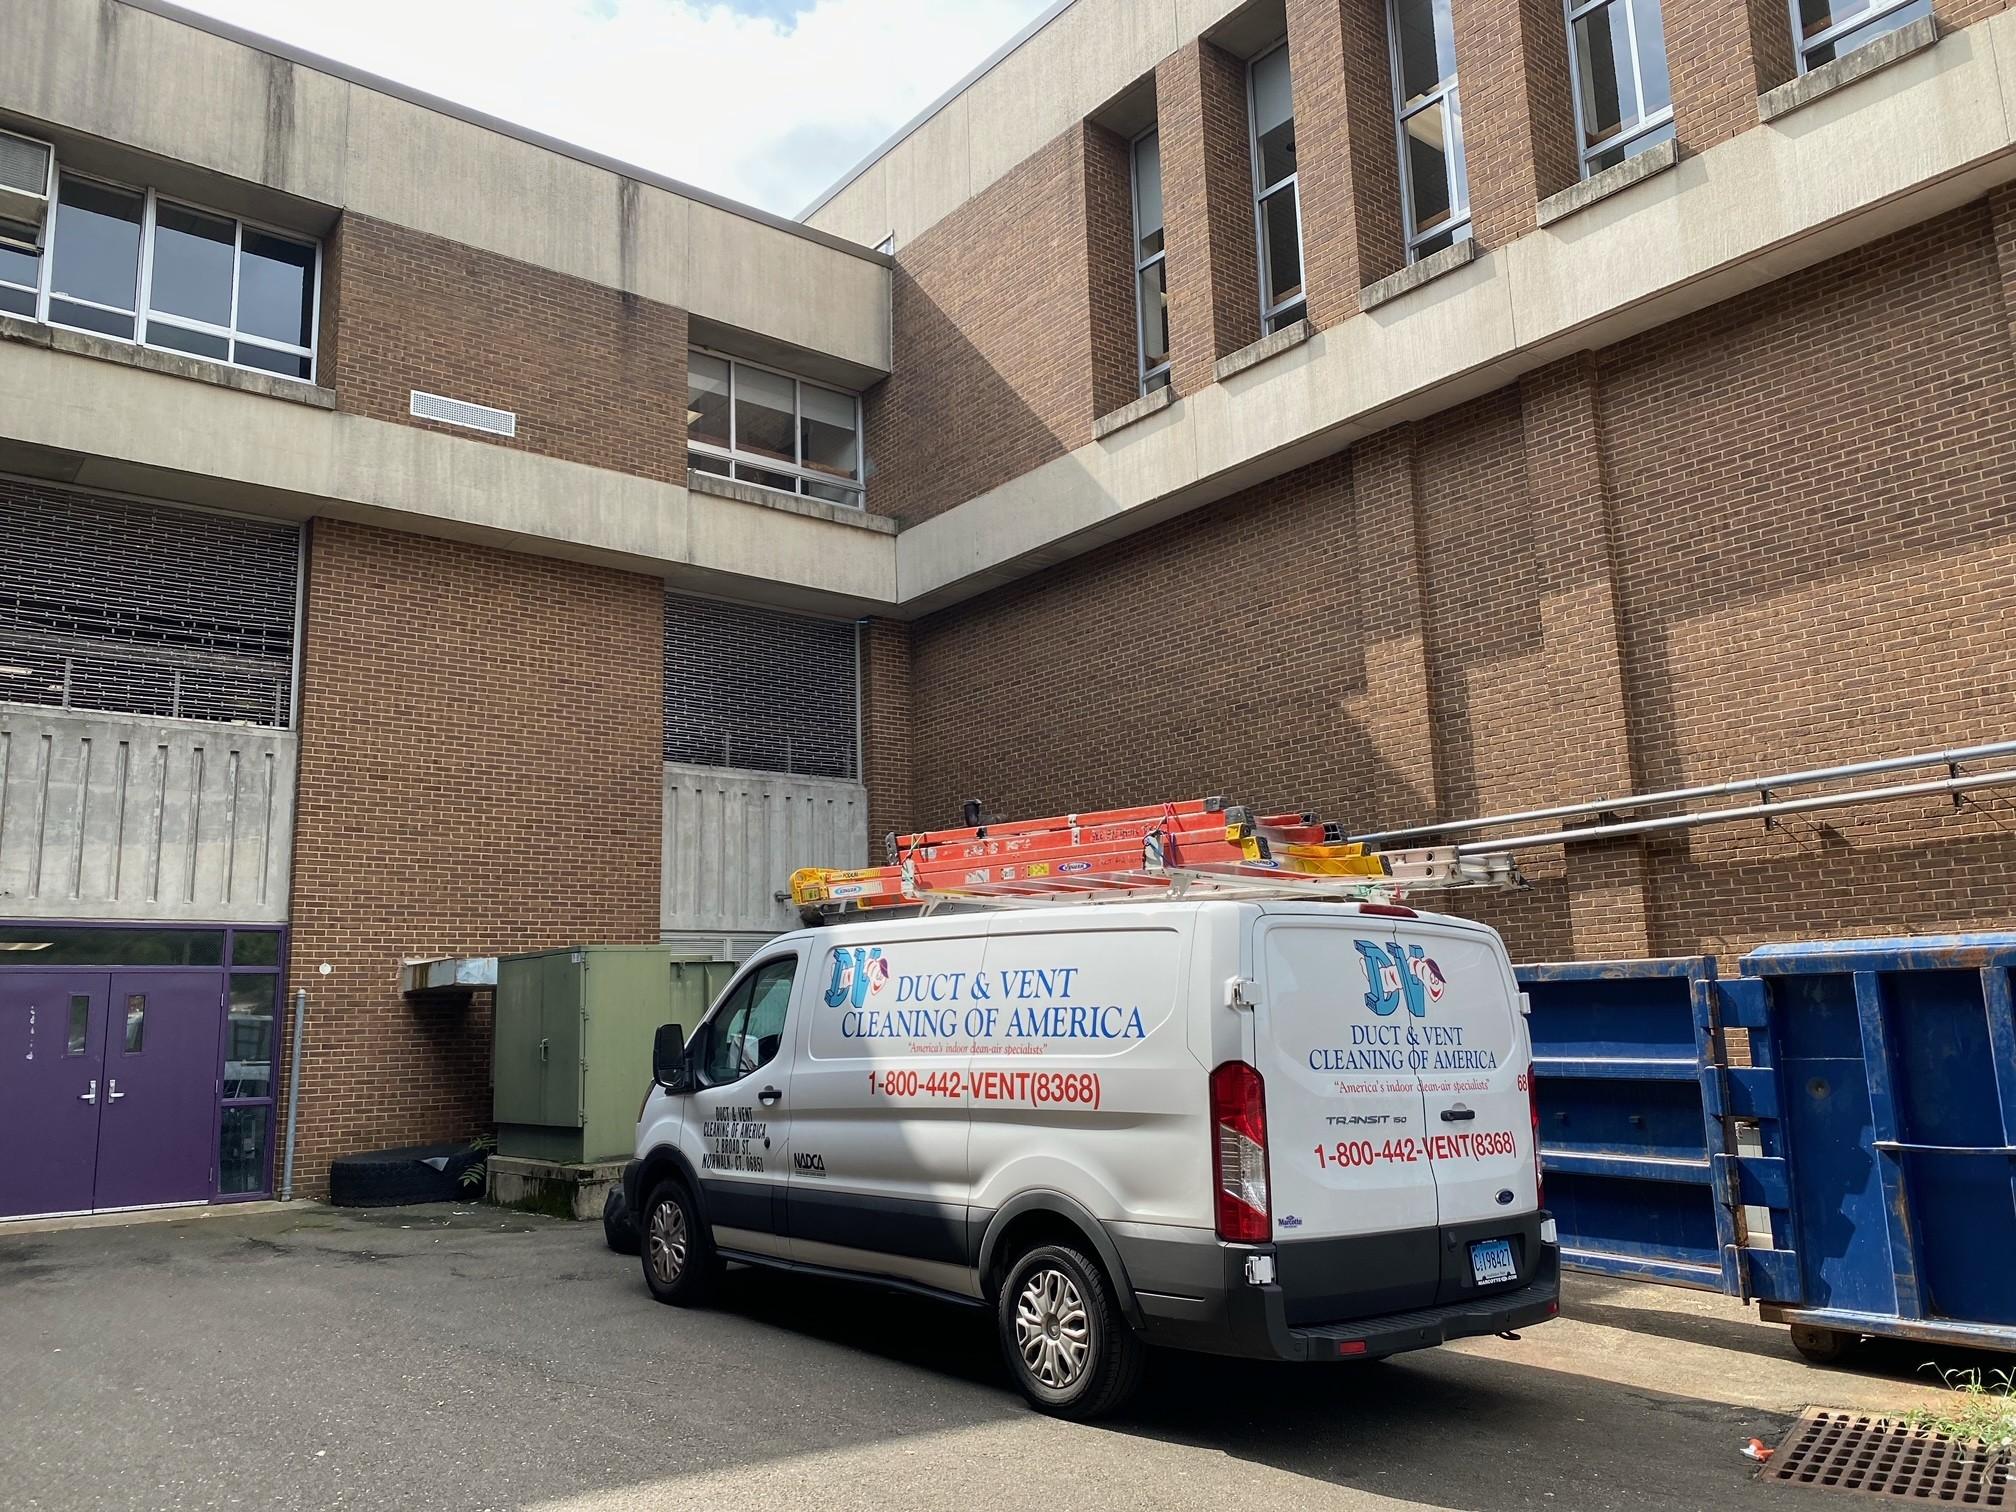 Westhill High School – Stamford, CT image002.jpg